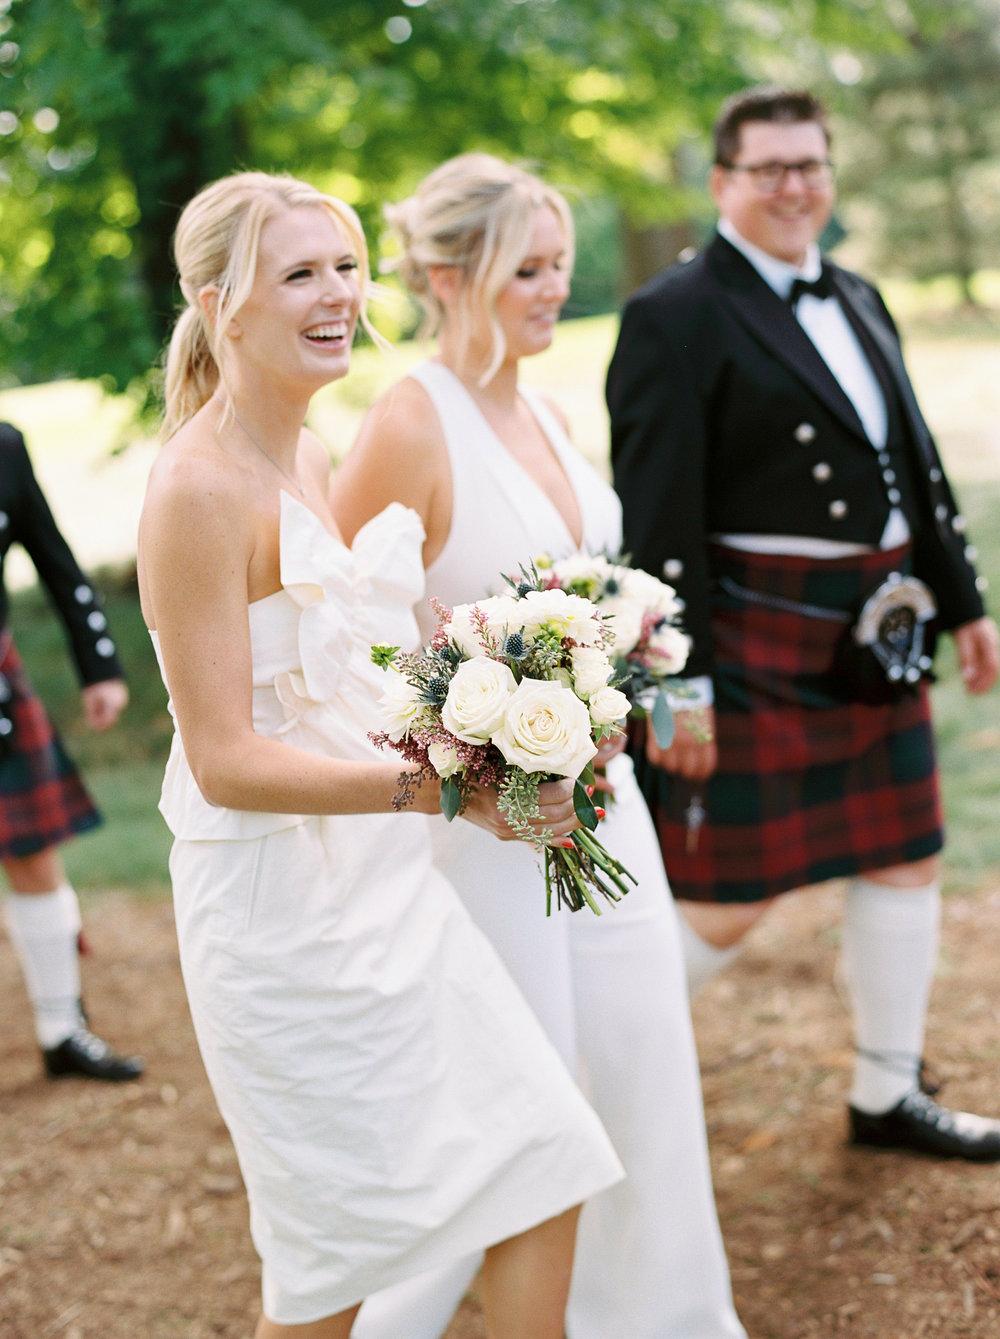 0199-Geneva-Ian-Wedding-Toronto Golf Club-When He Found Her-TorontoPhotographer.jpg